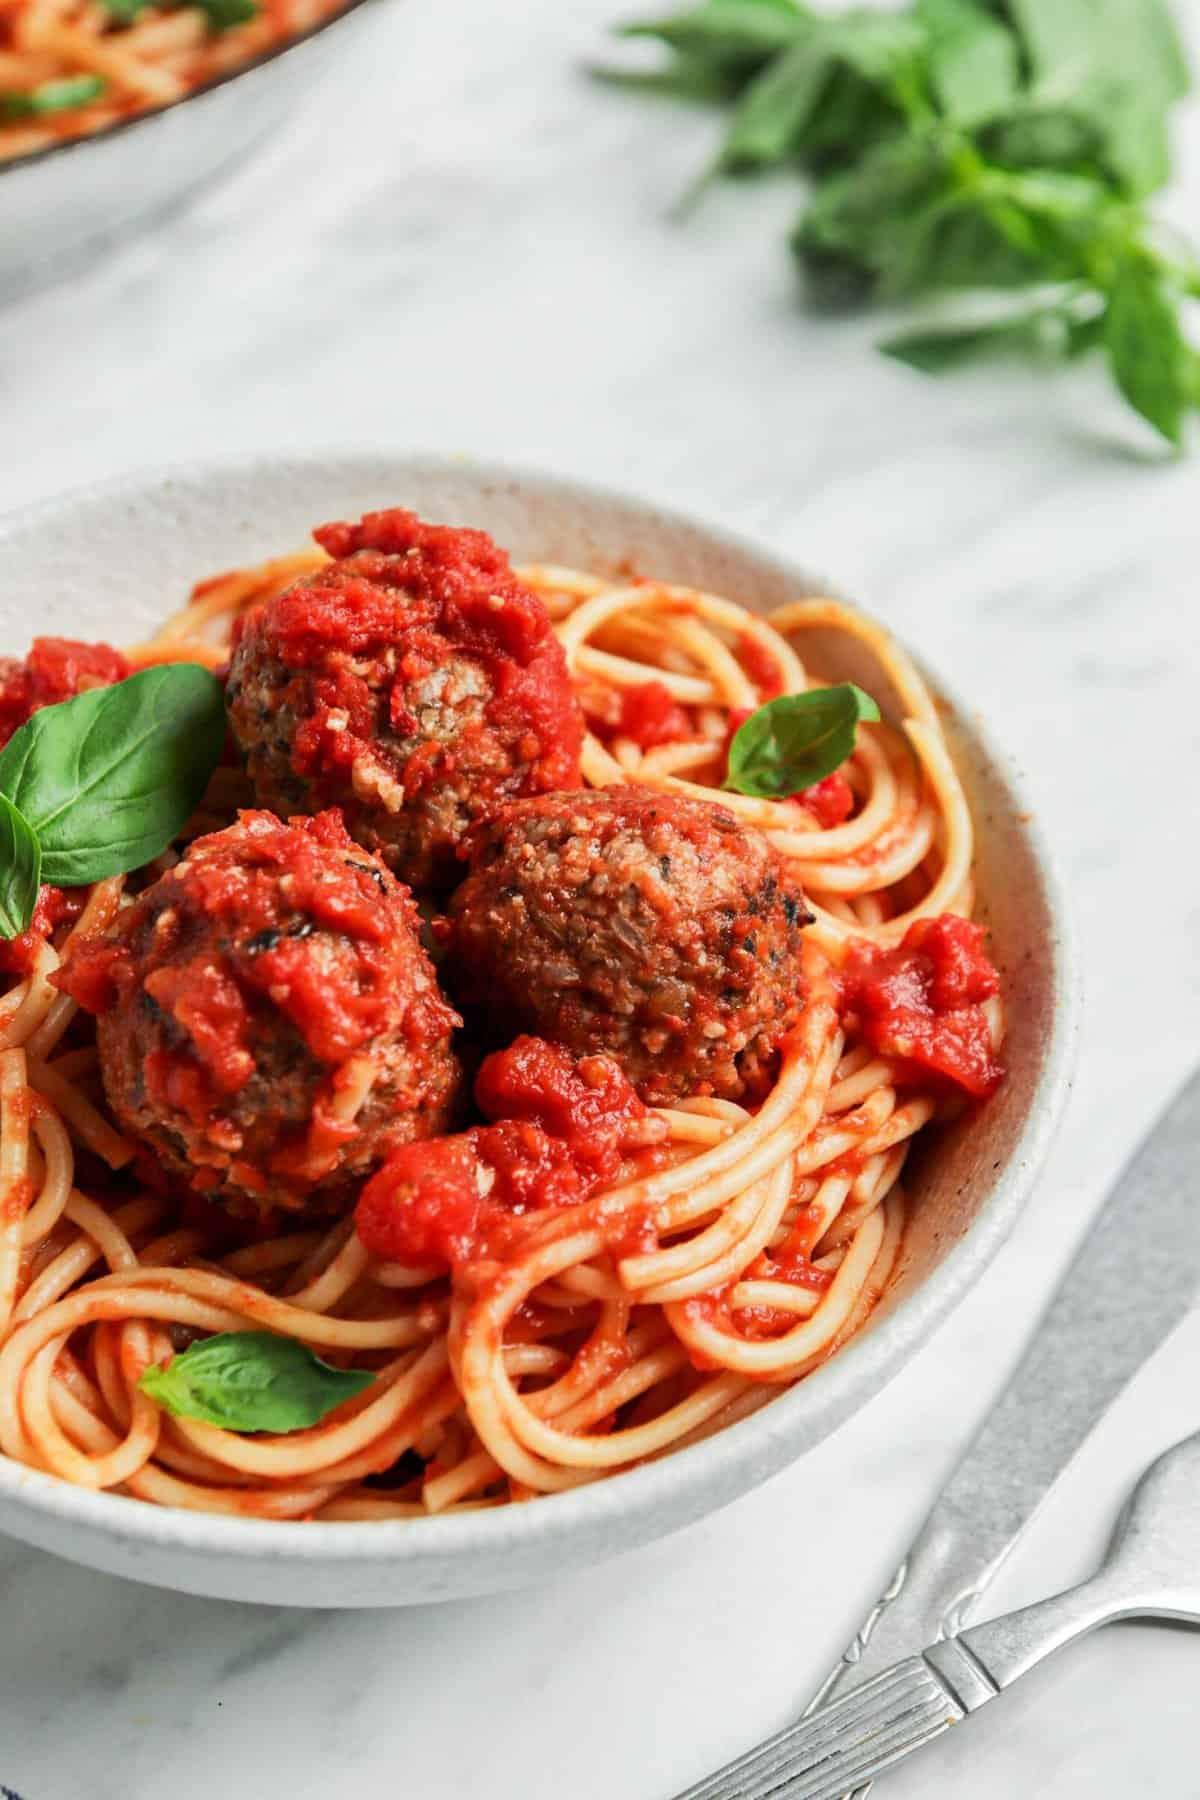 The Best Italian Vegan Meatballs Ever! (gluten-free + soy-free too)